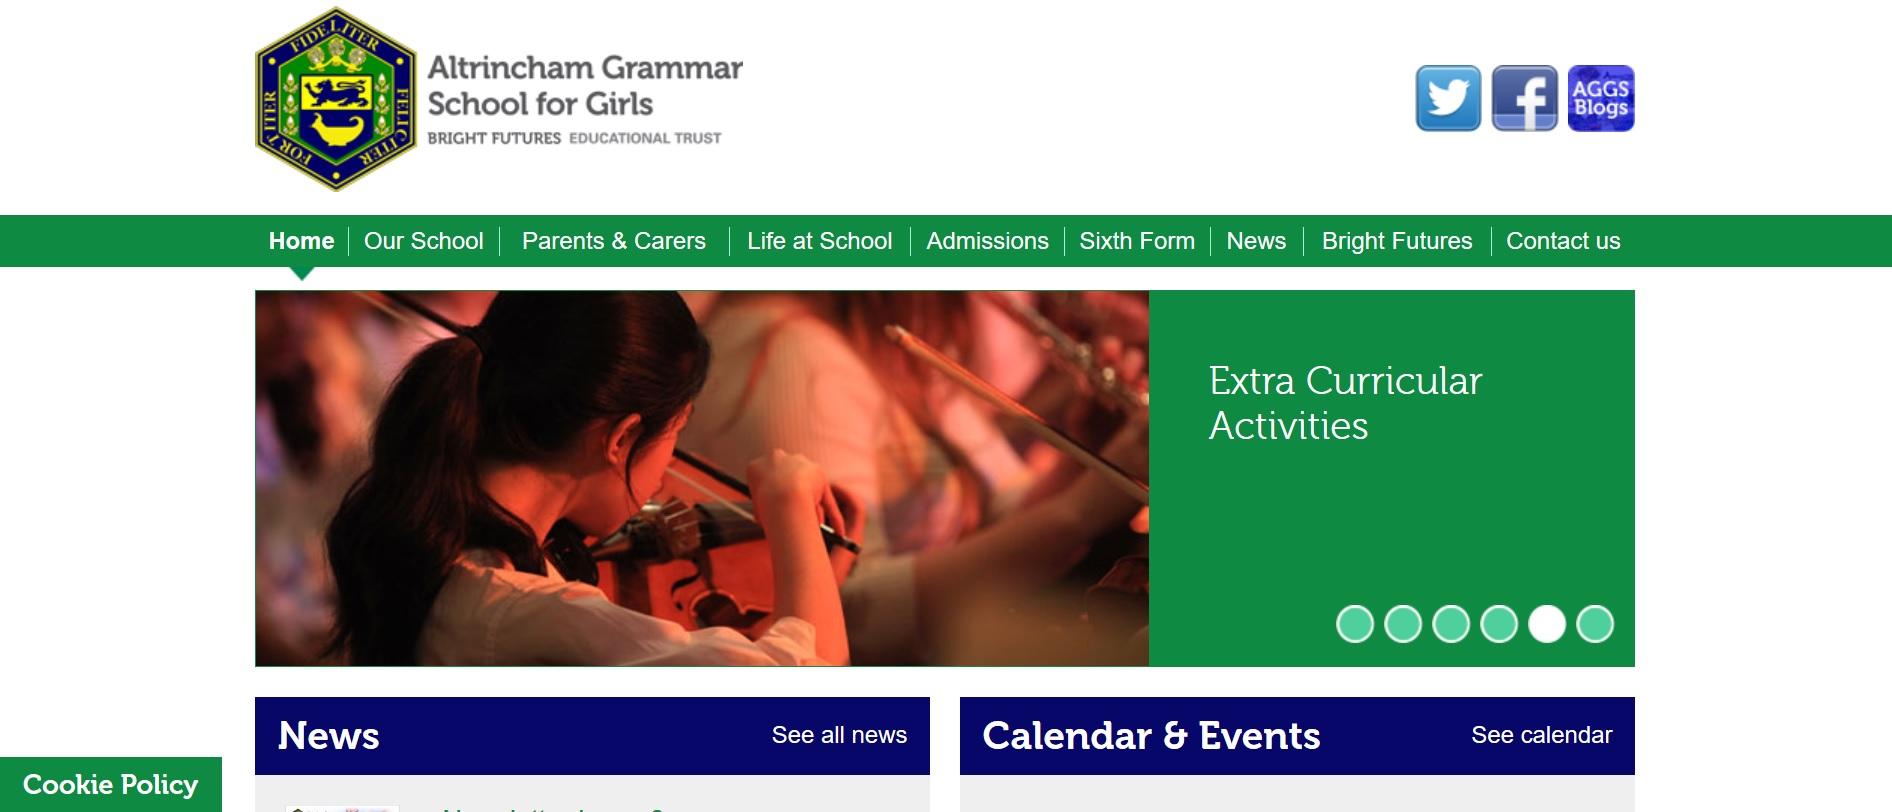 Altrincham Grammar School For Girls 11 Plus 11 Exam Information